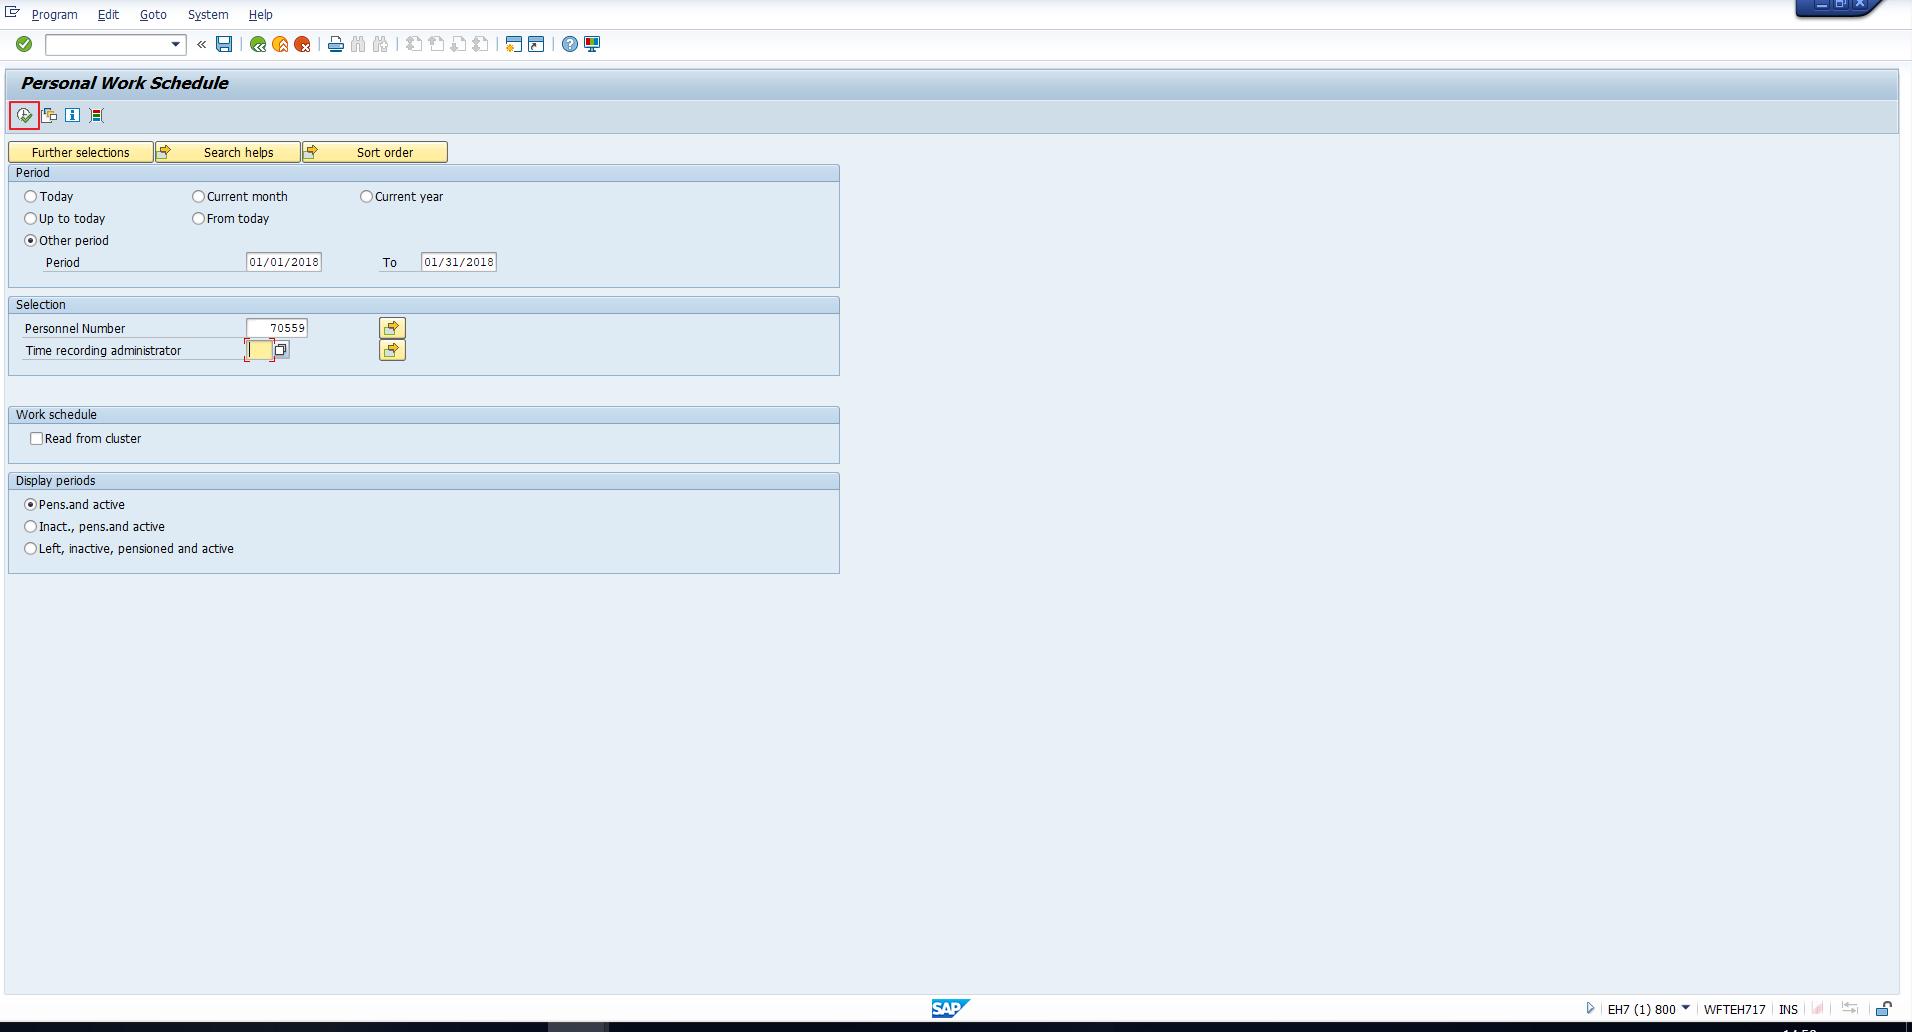 Figure 3: Selection Screen Values